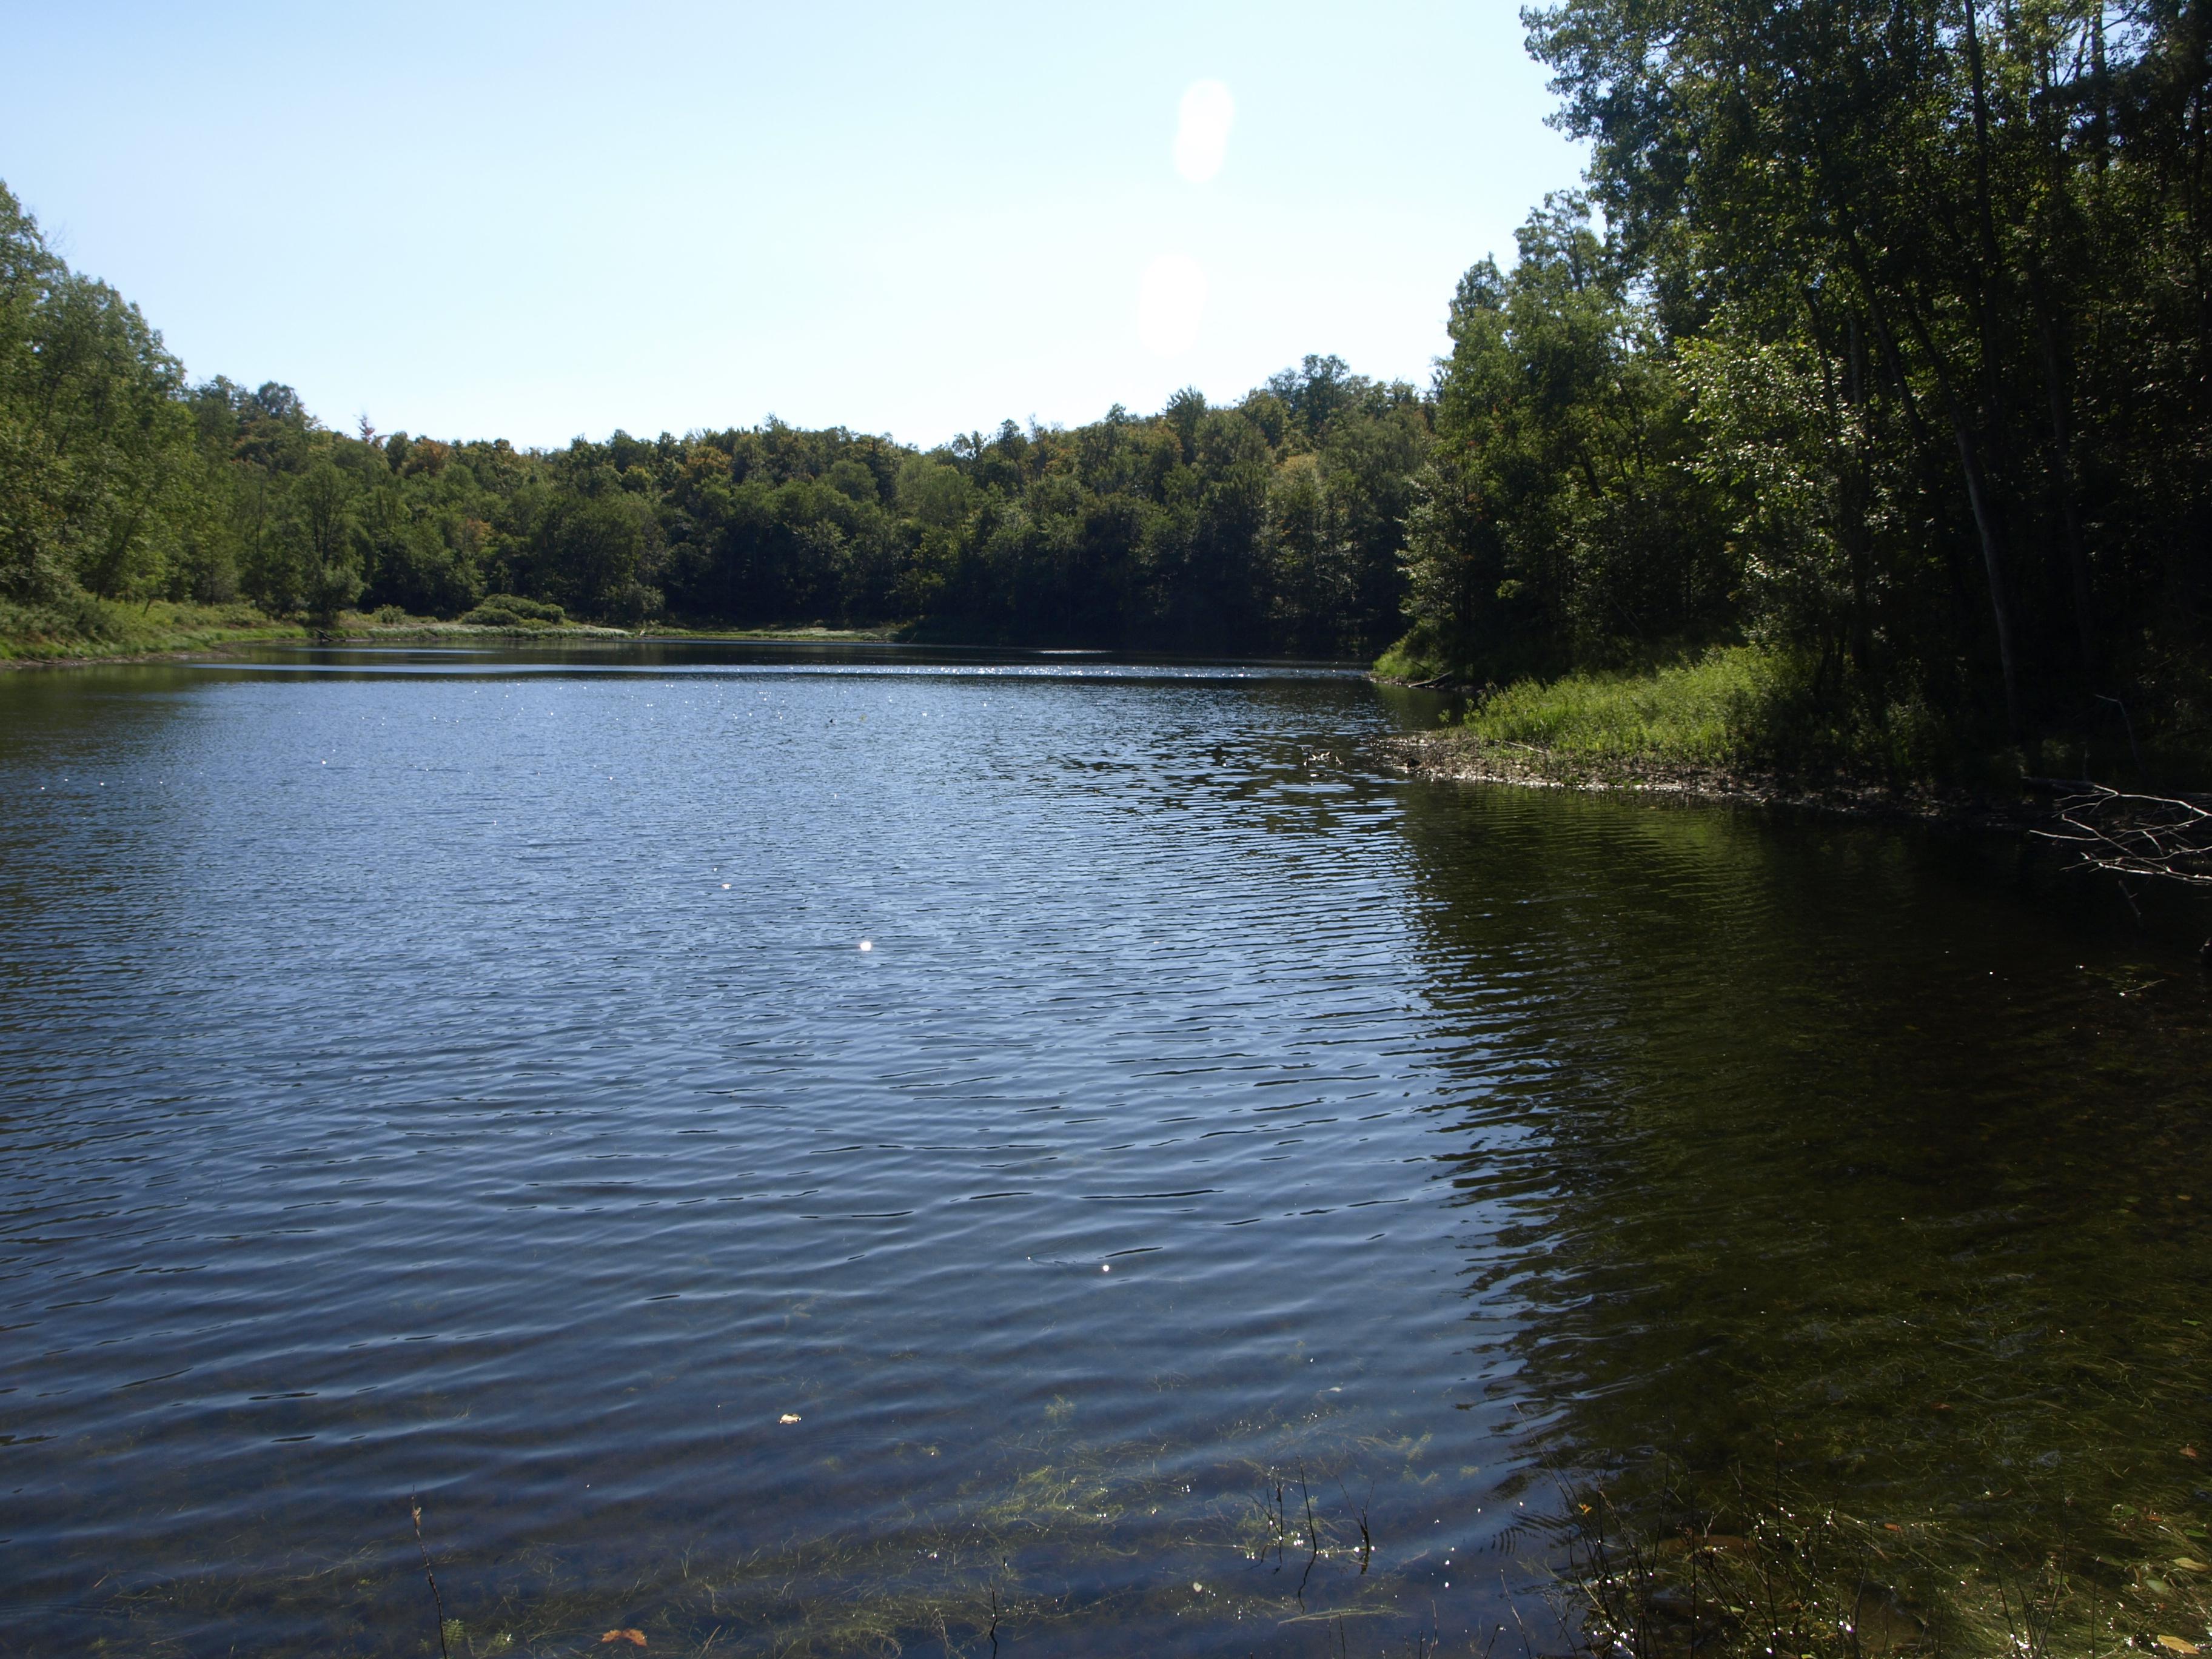 Readway Ponds